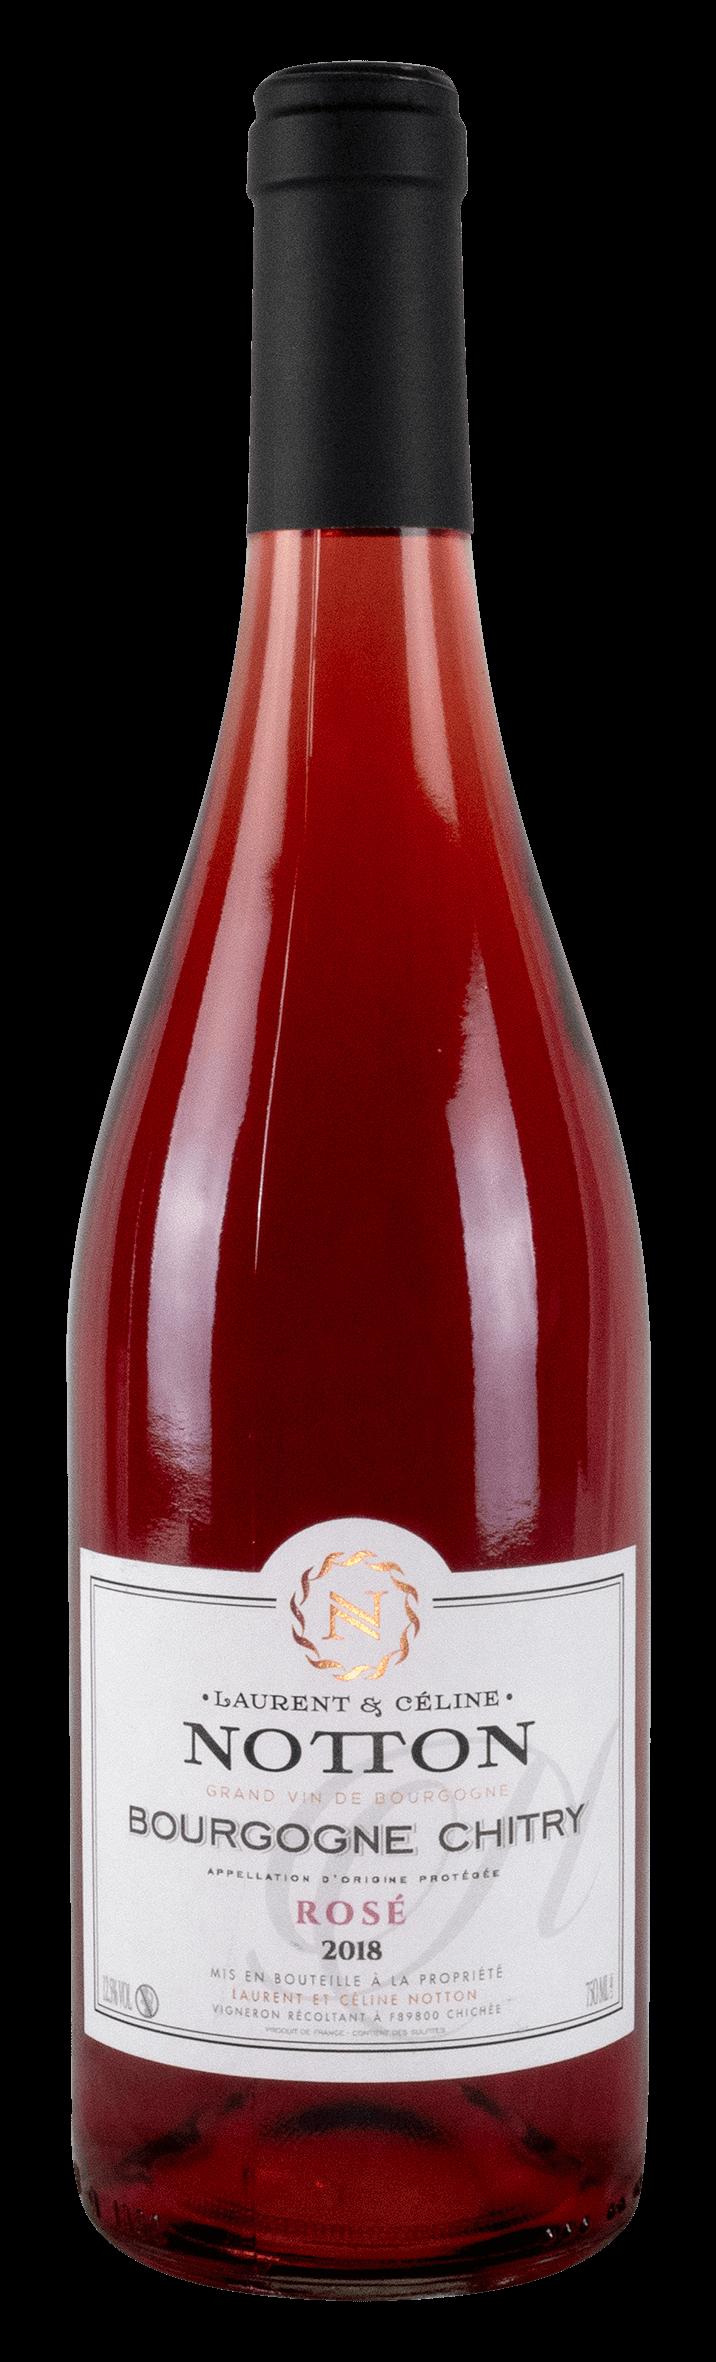 bouteille NOTTON Bourgogne Chitry Rose 2018